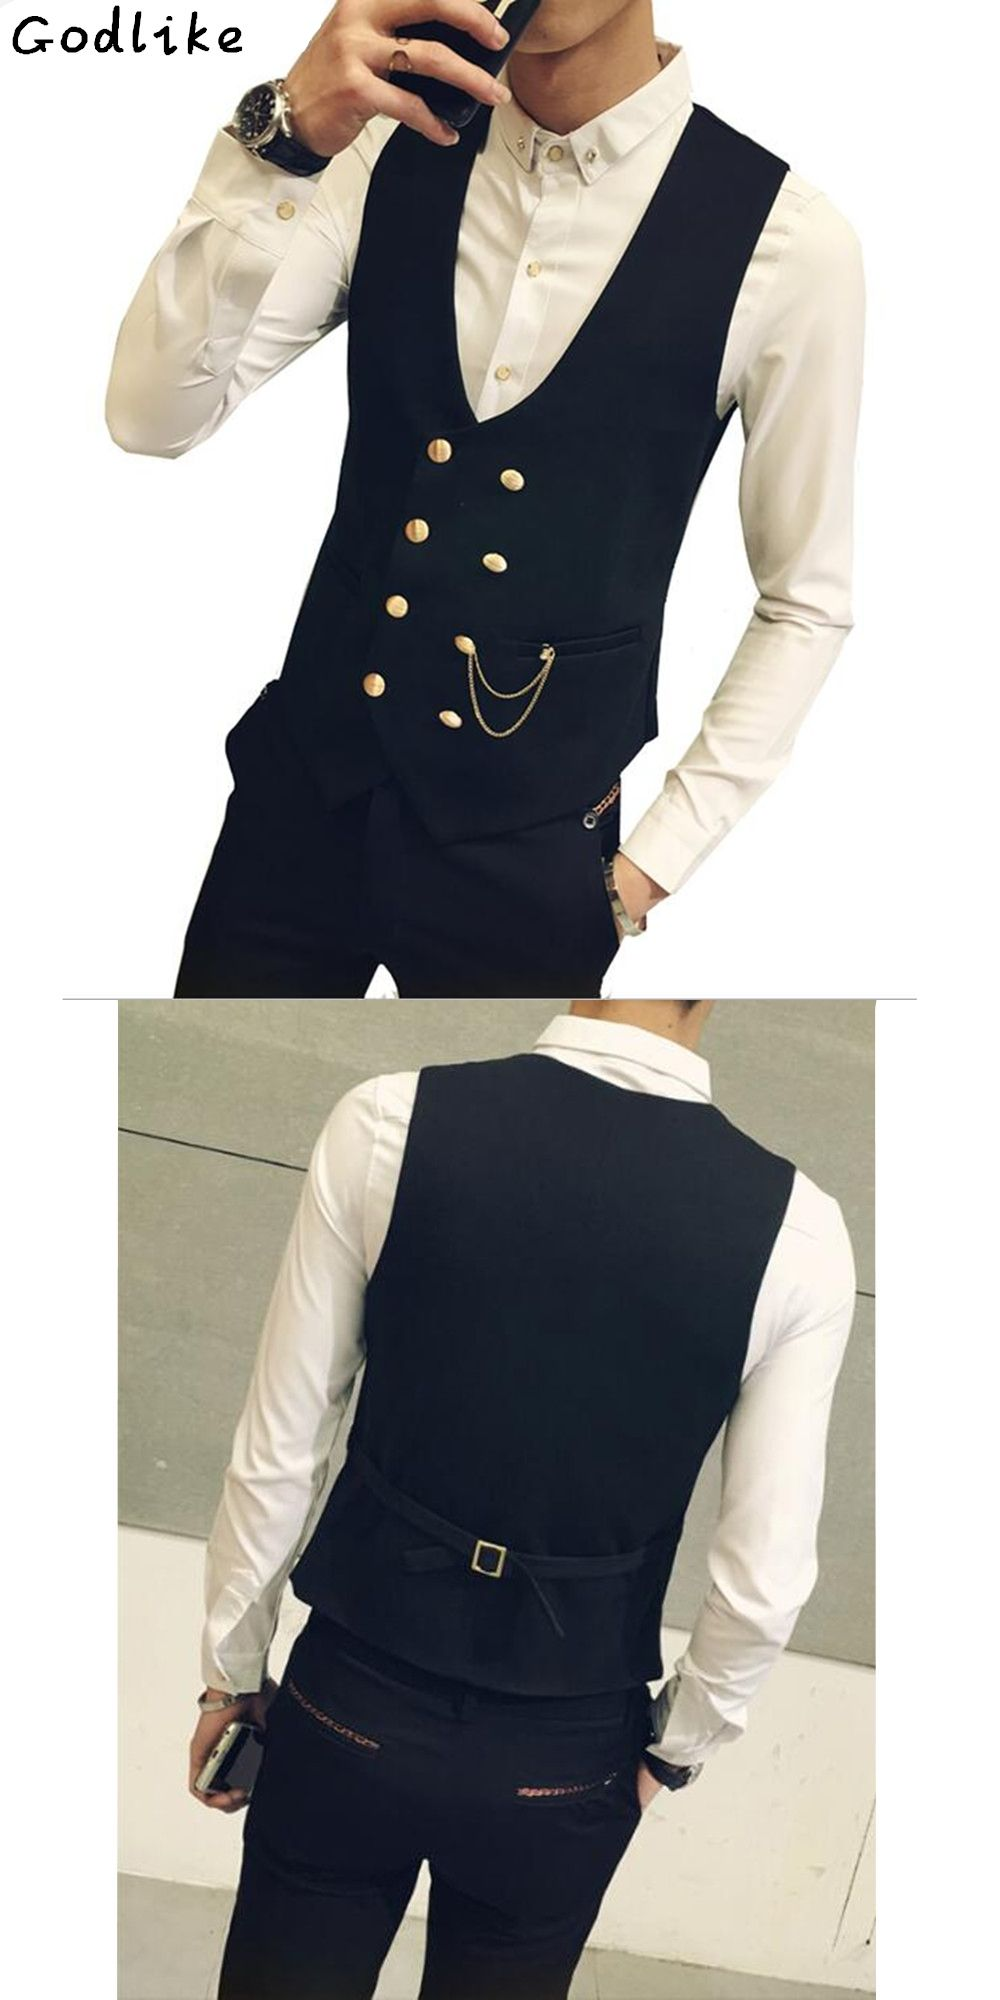 72b7391de86 2018 Mens vests And waistcoats Slim Fit Masculino Cotton Double Breasted  Sleeveless Jacket Waistcoat Suit Collar Men Suit Vest